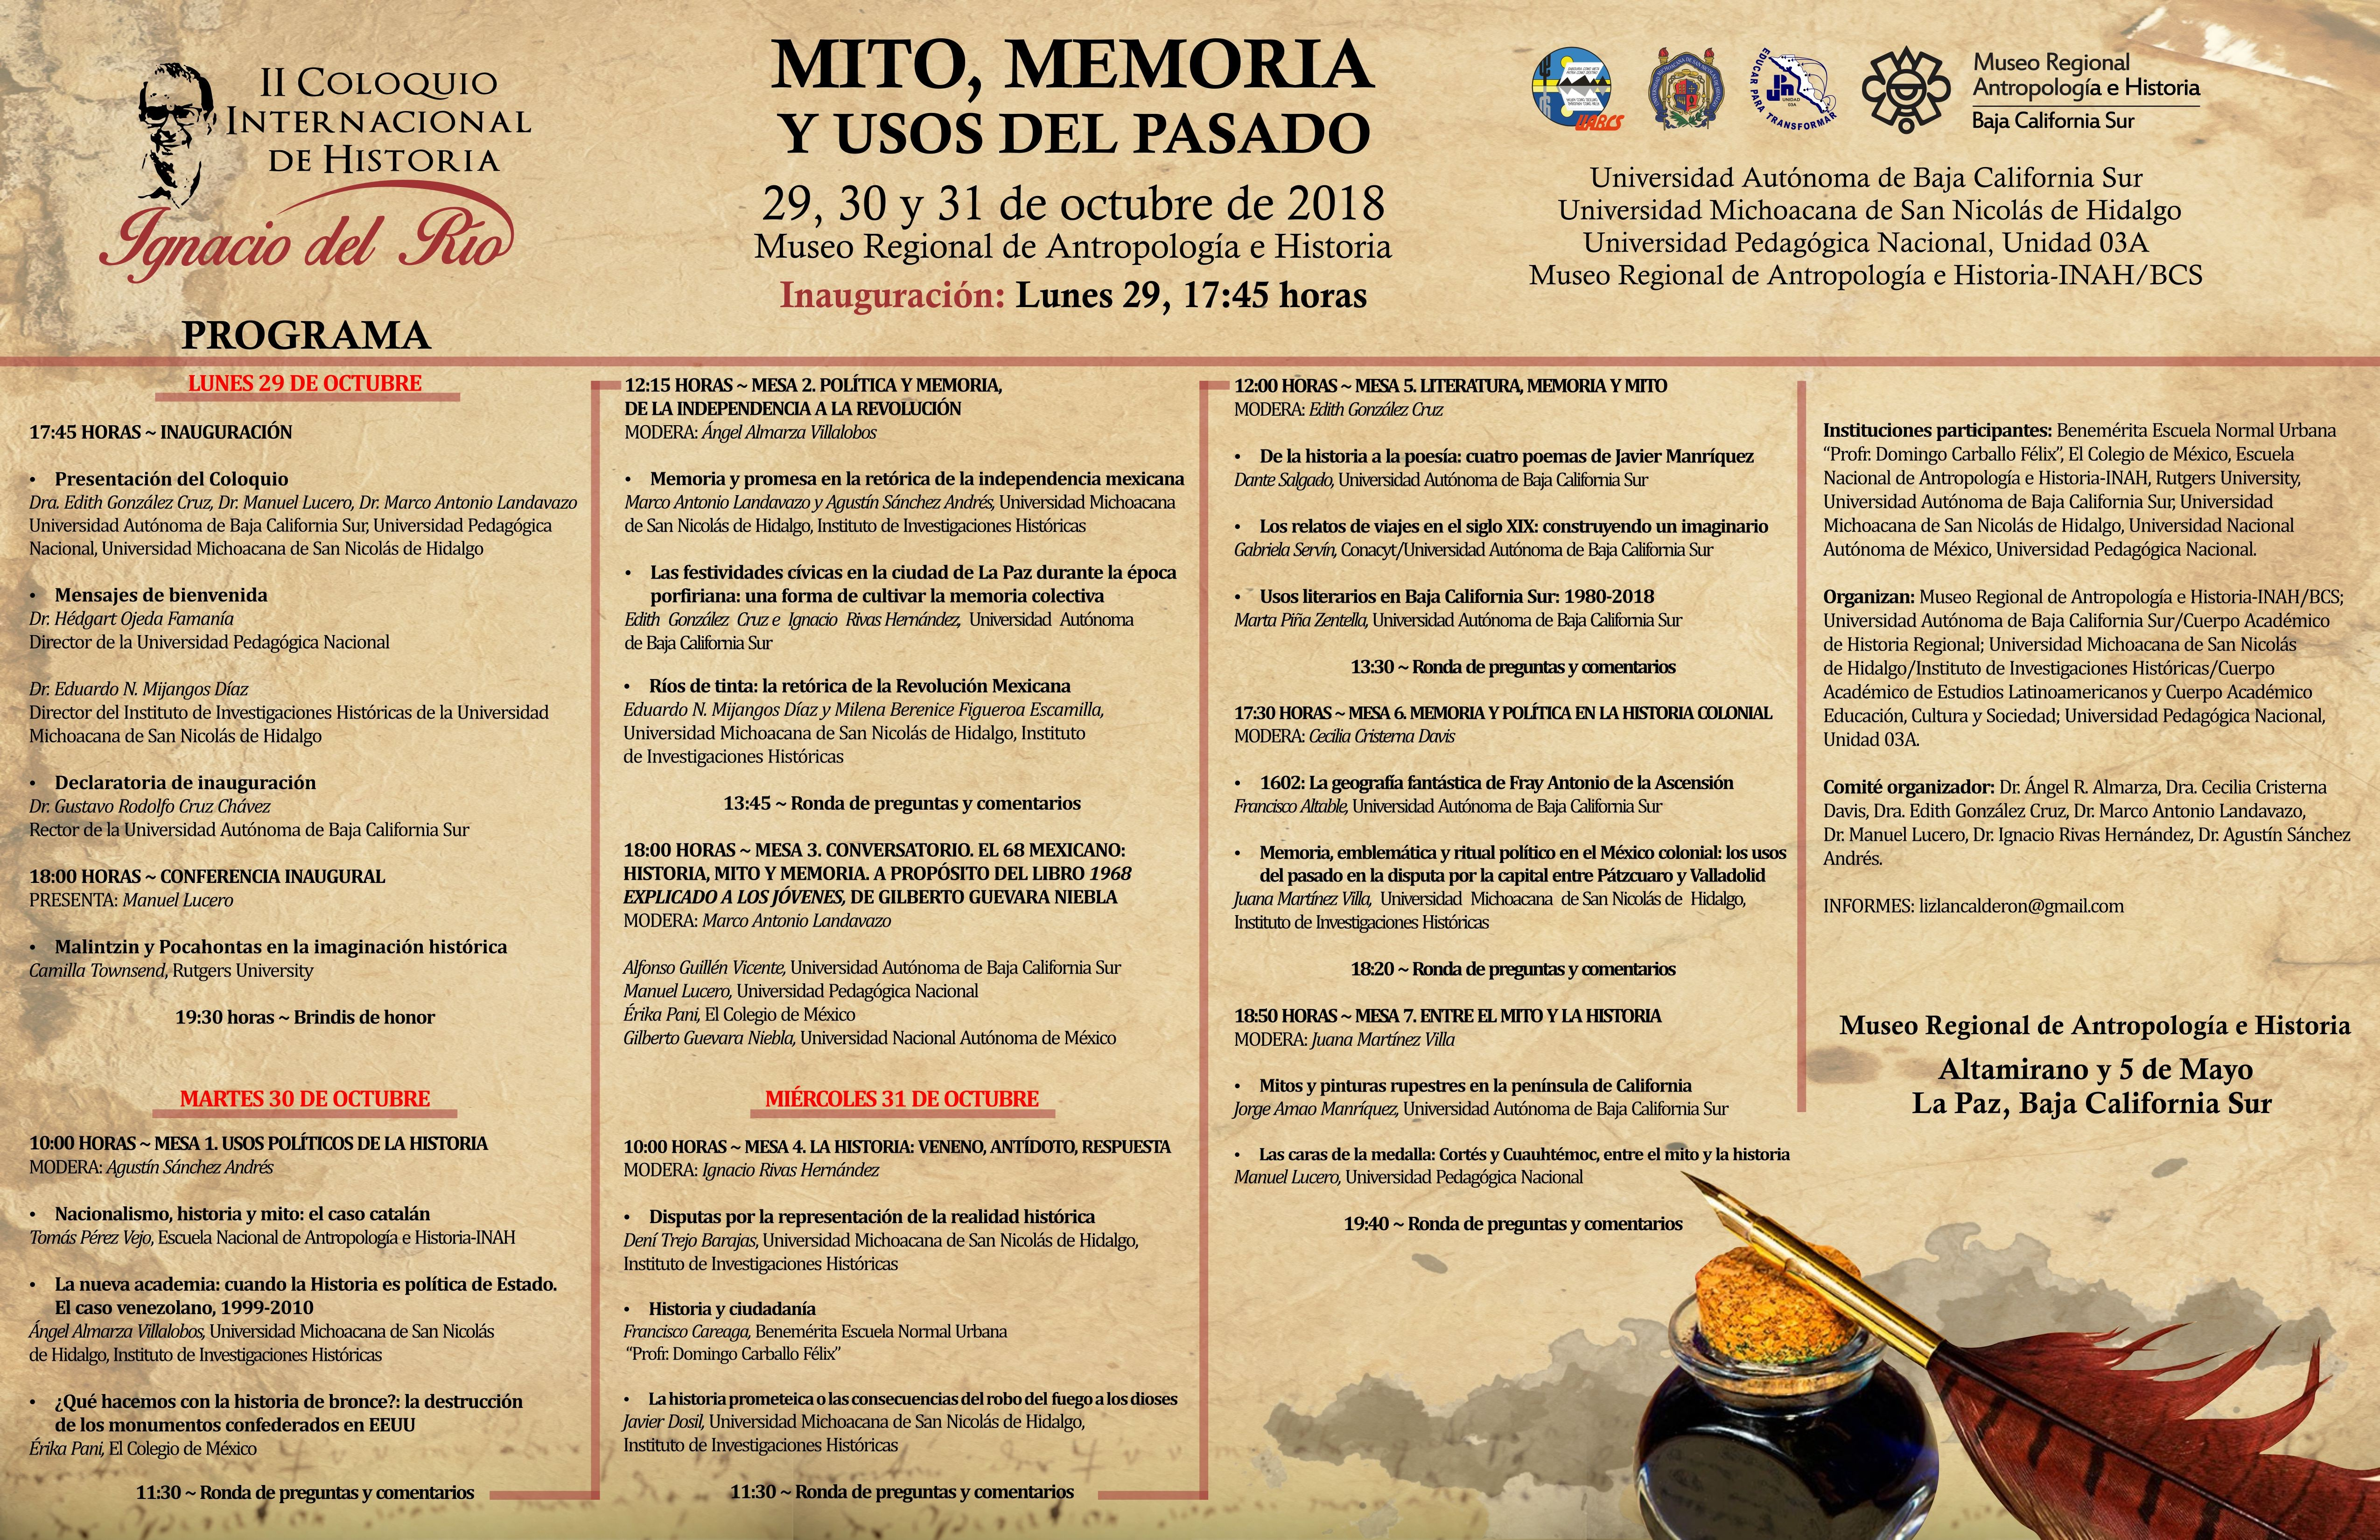 Universidad Aut³noma de Baja California Sur